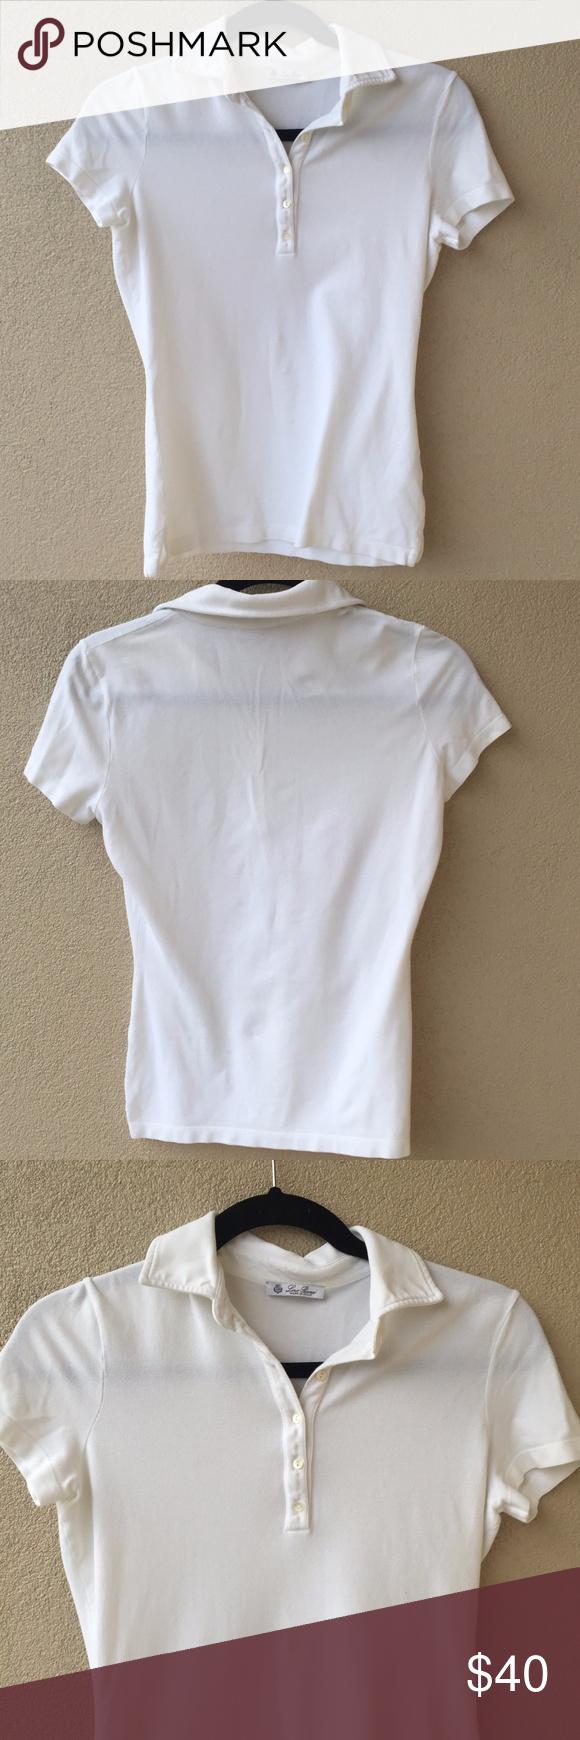 Woman Polo Shirts loro piana white cotton polo shirt woman